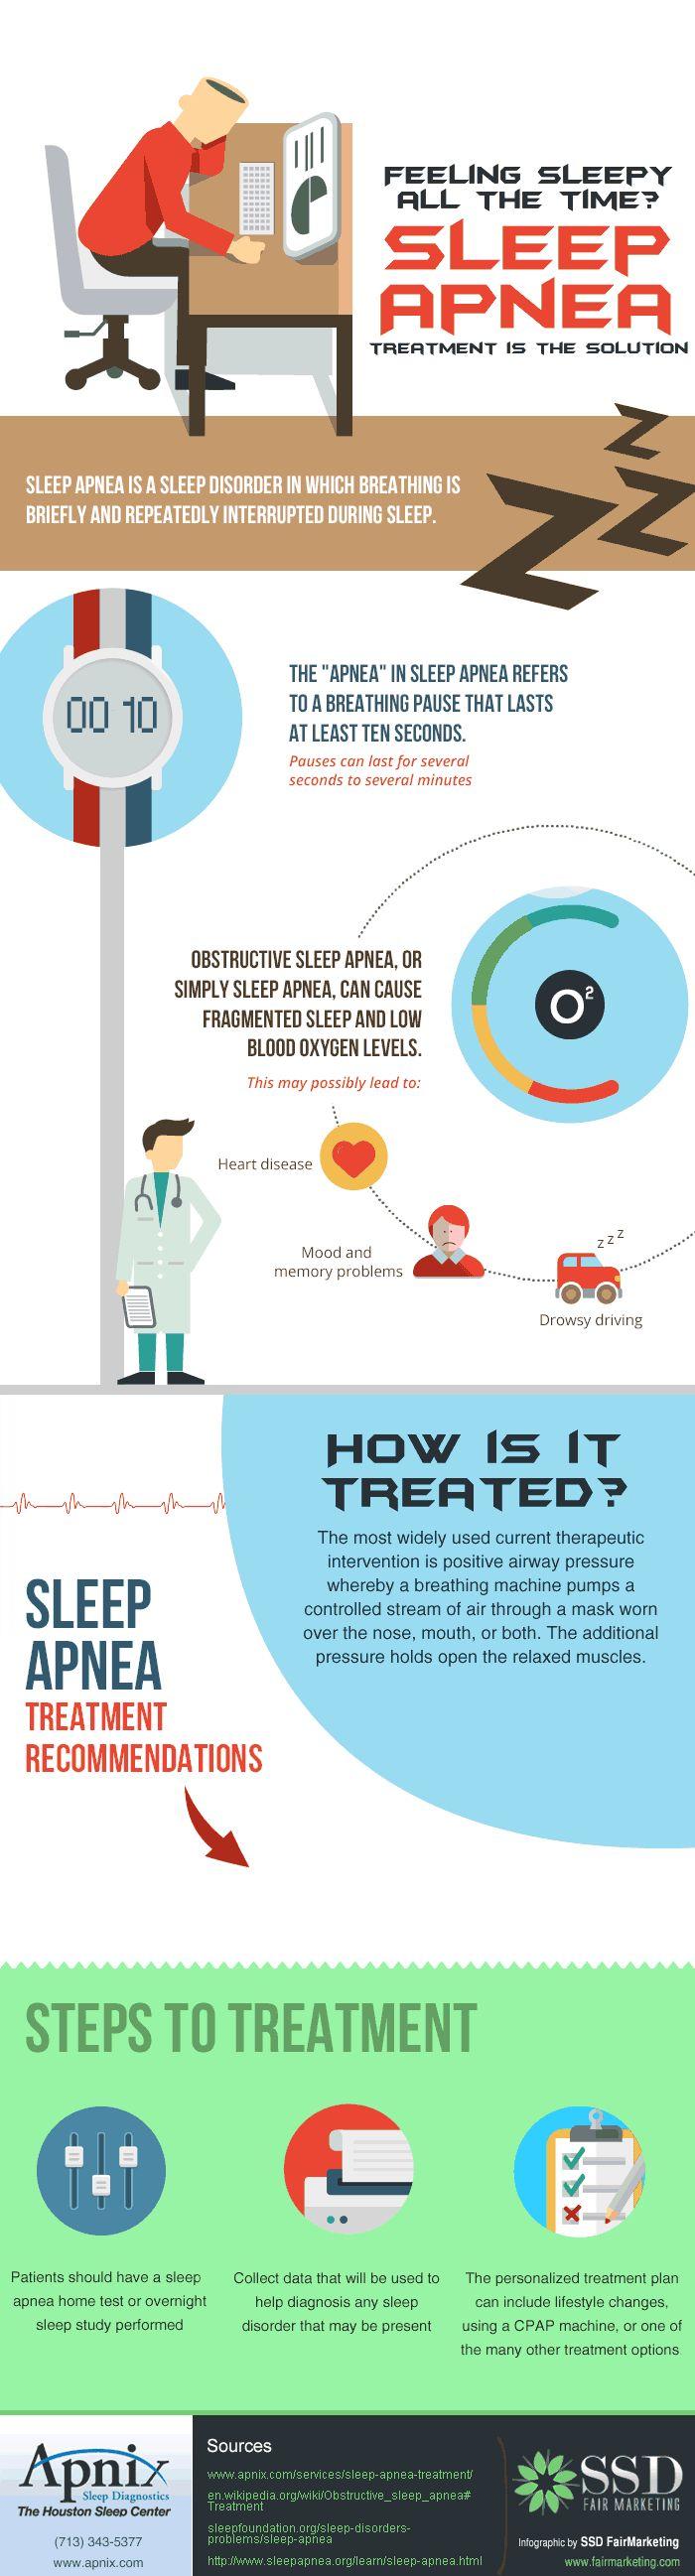 Gifographic for Sleep Apnea